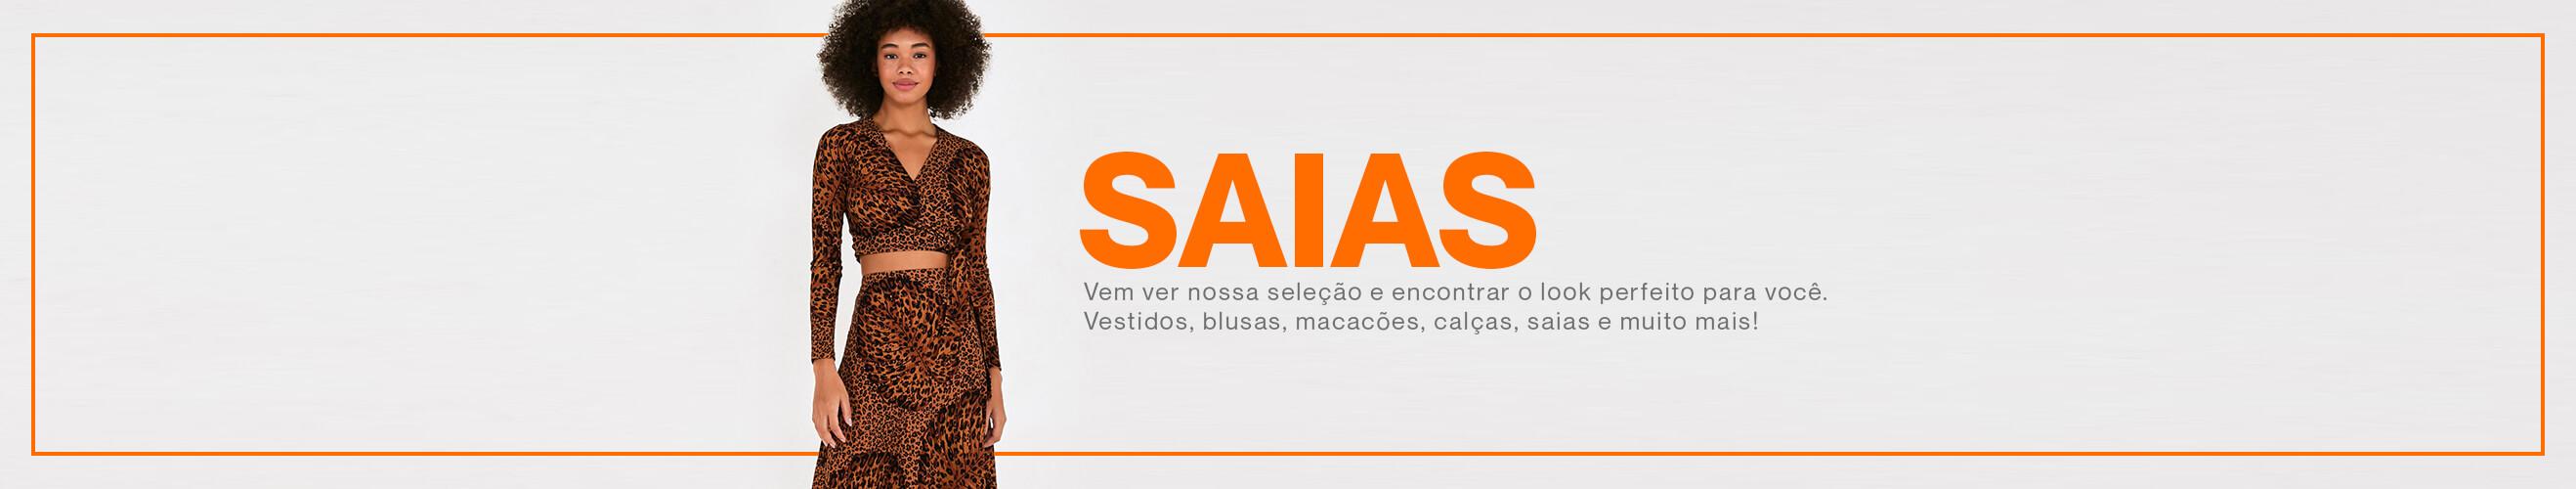 Banner desktop - Saias